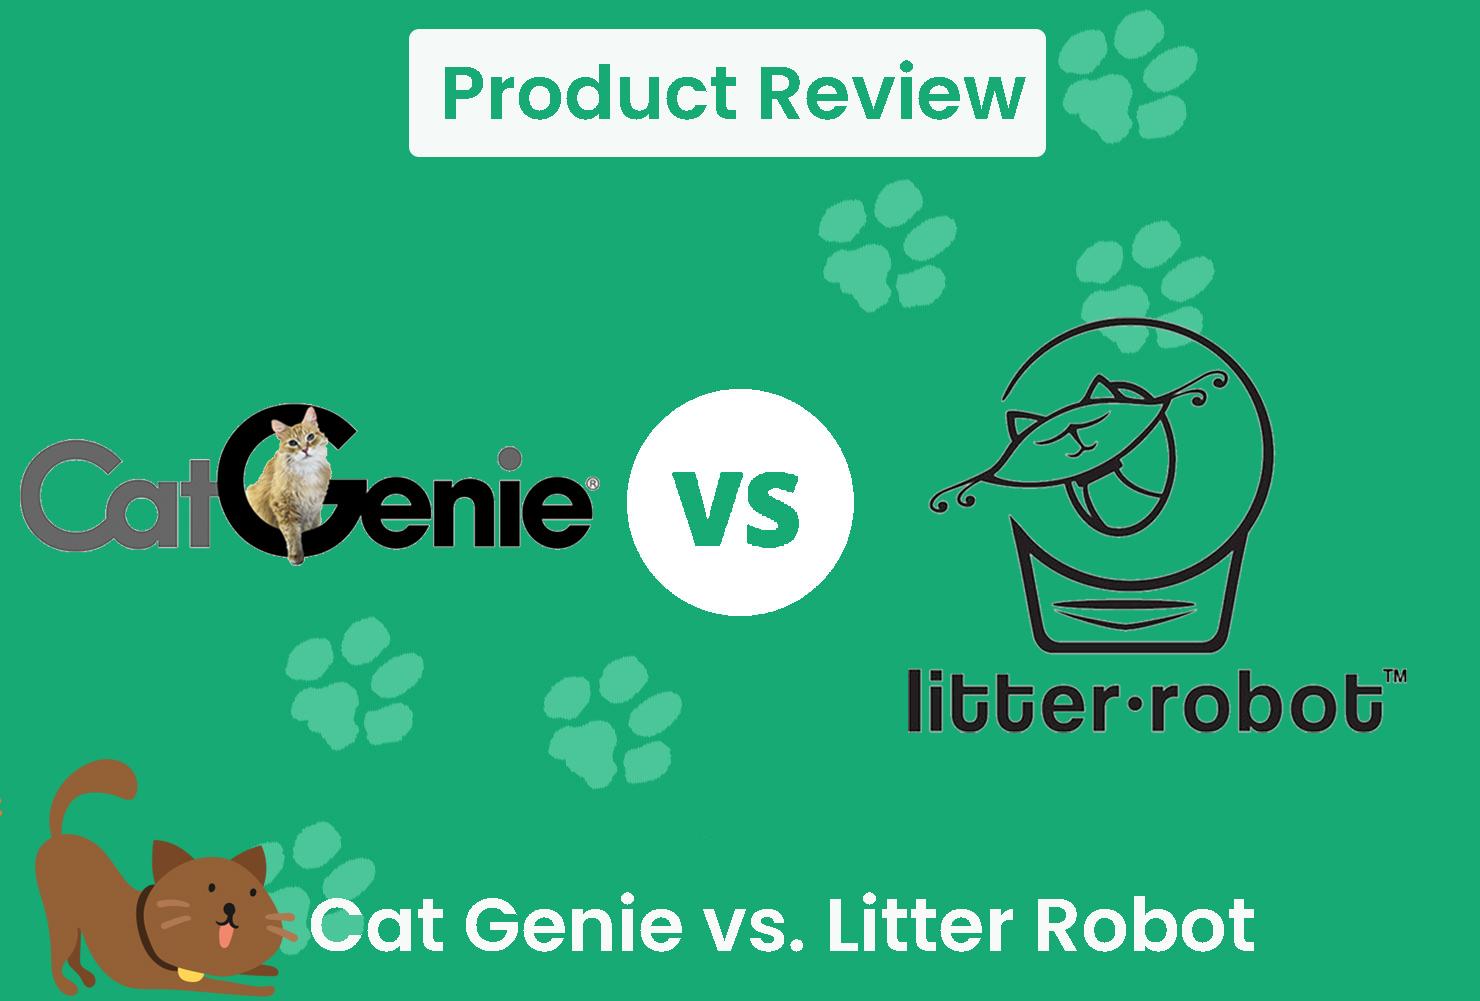 cat genie vs litter robot